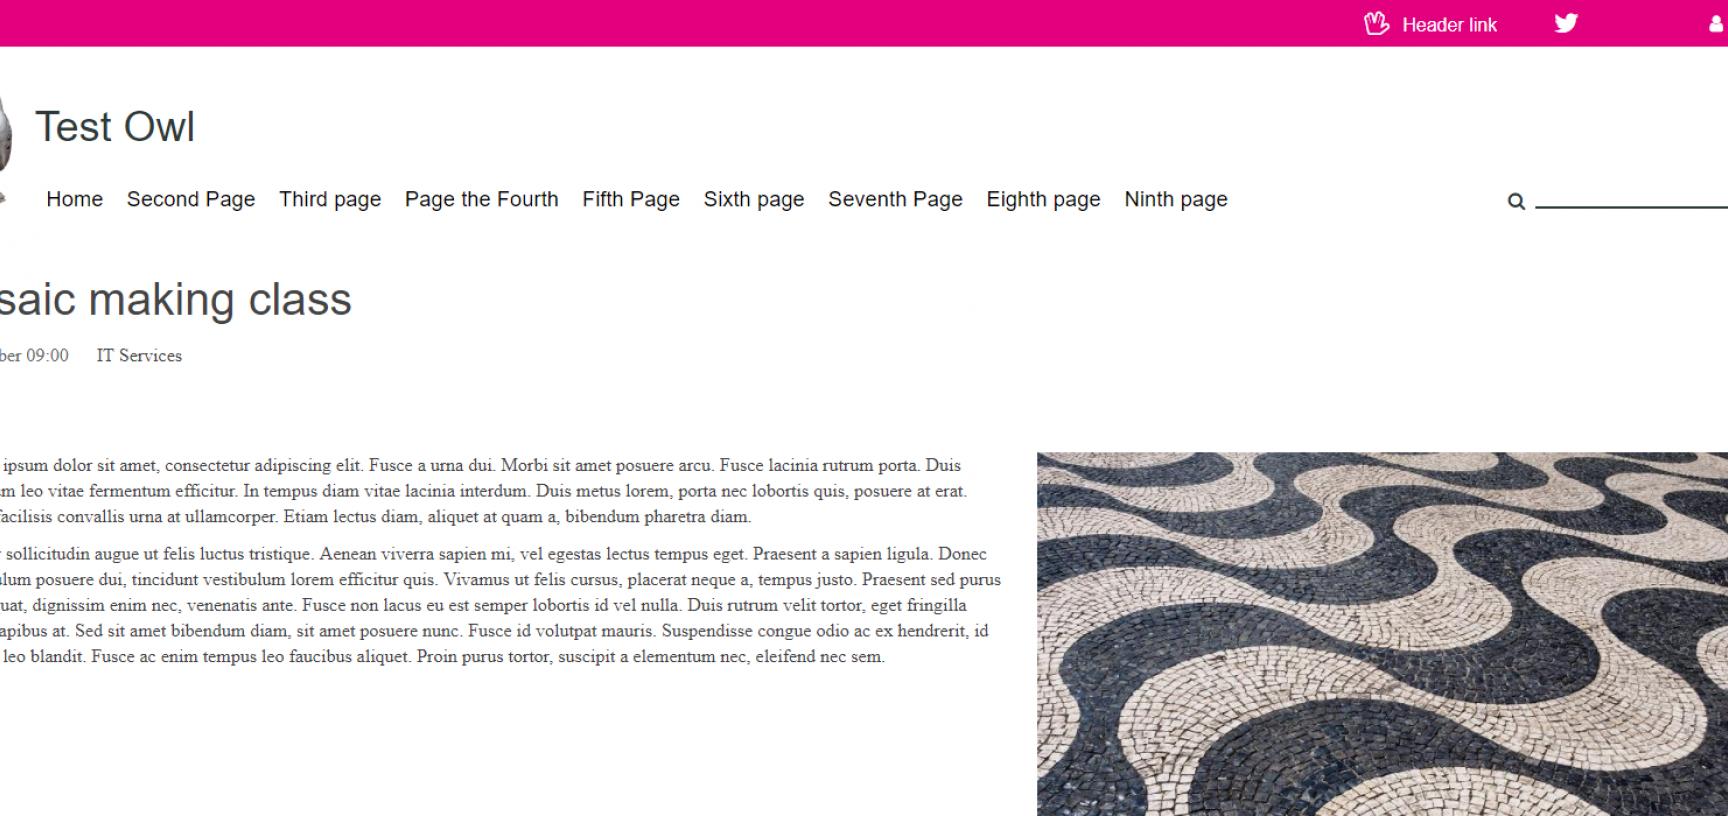 Content on the original site